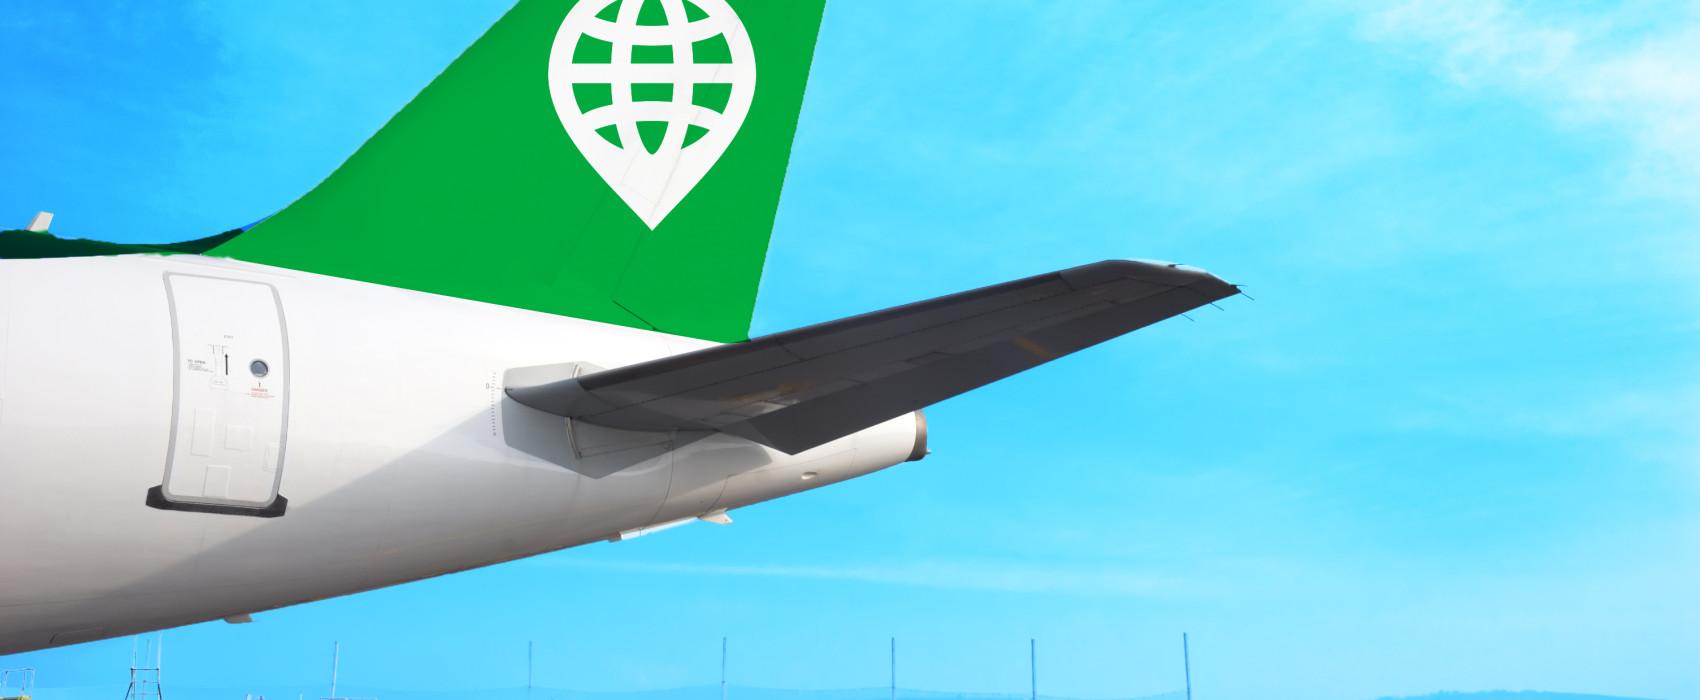 International Transportation Management - Air Freight Forwarder